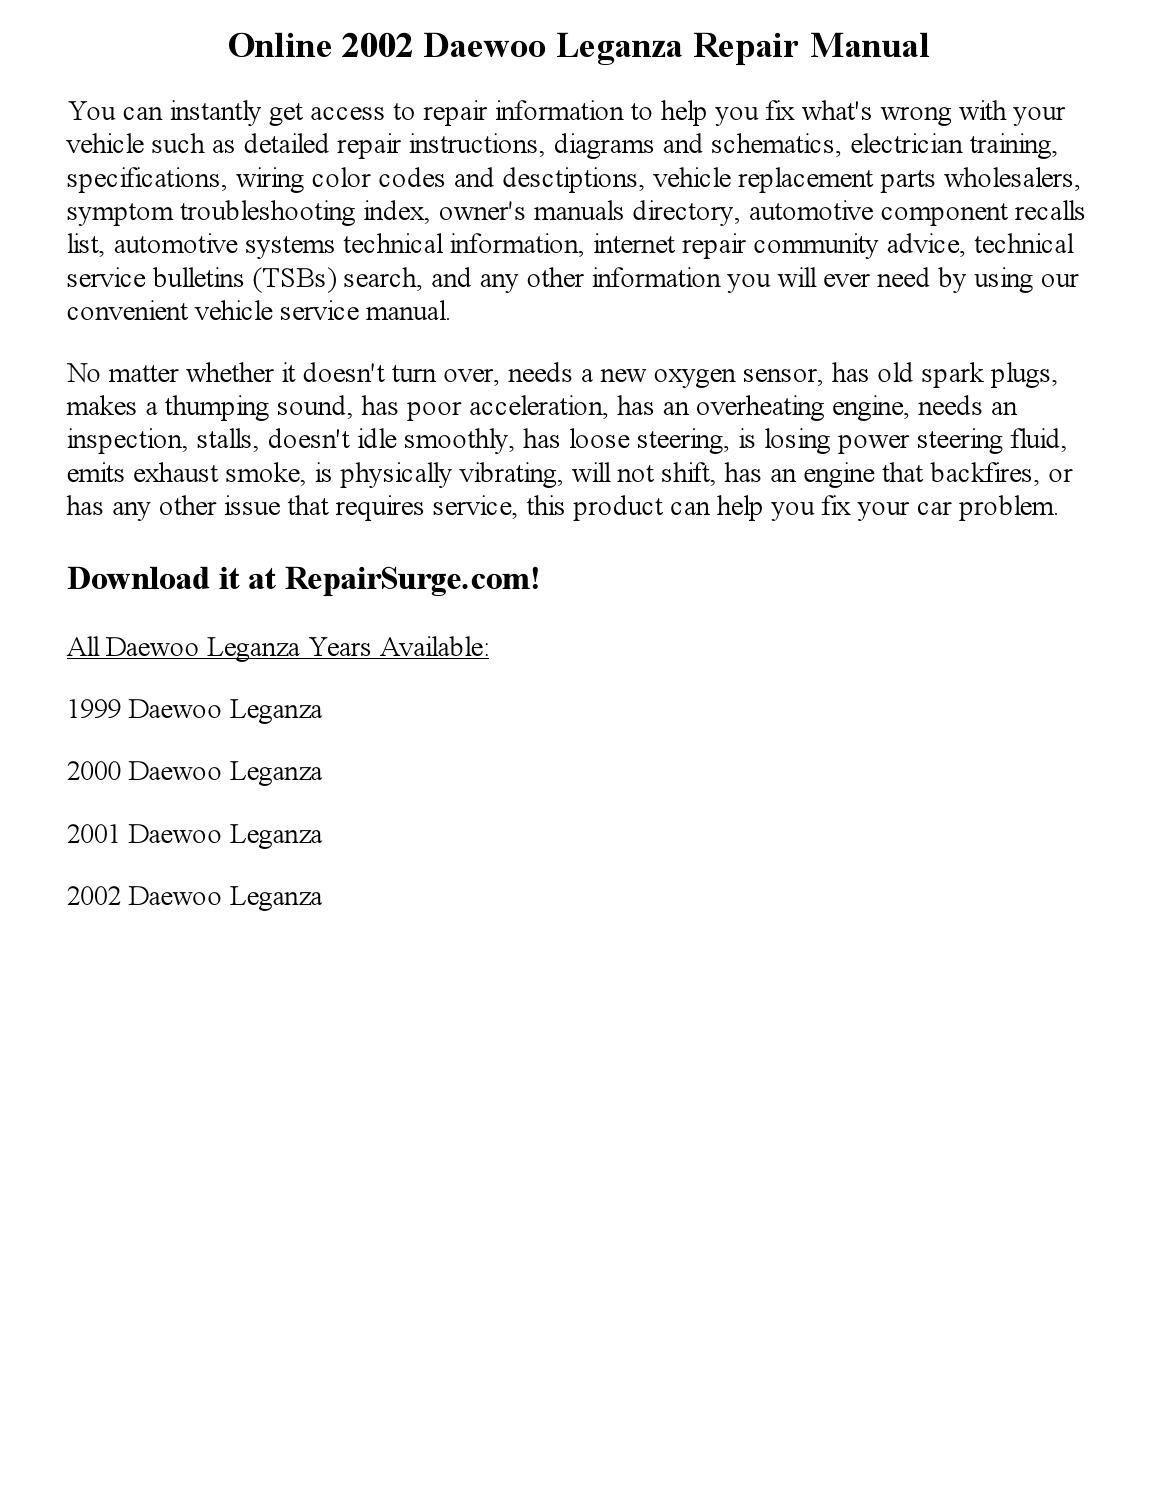 2002 daewoo leganza re...Daewoo Leganza Power Steering Parts Diagram